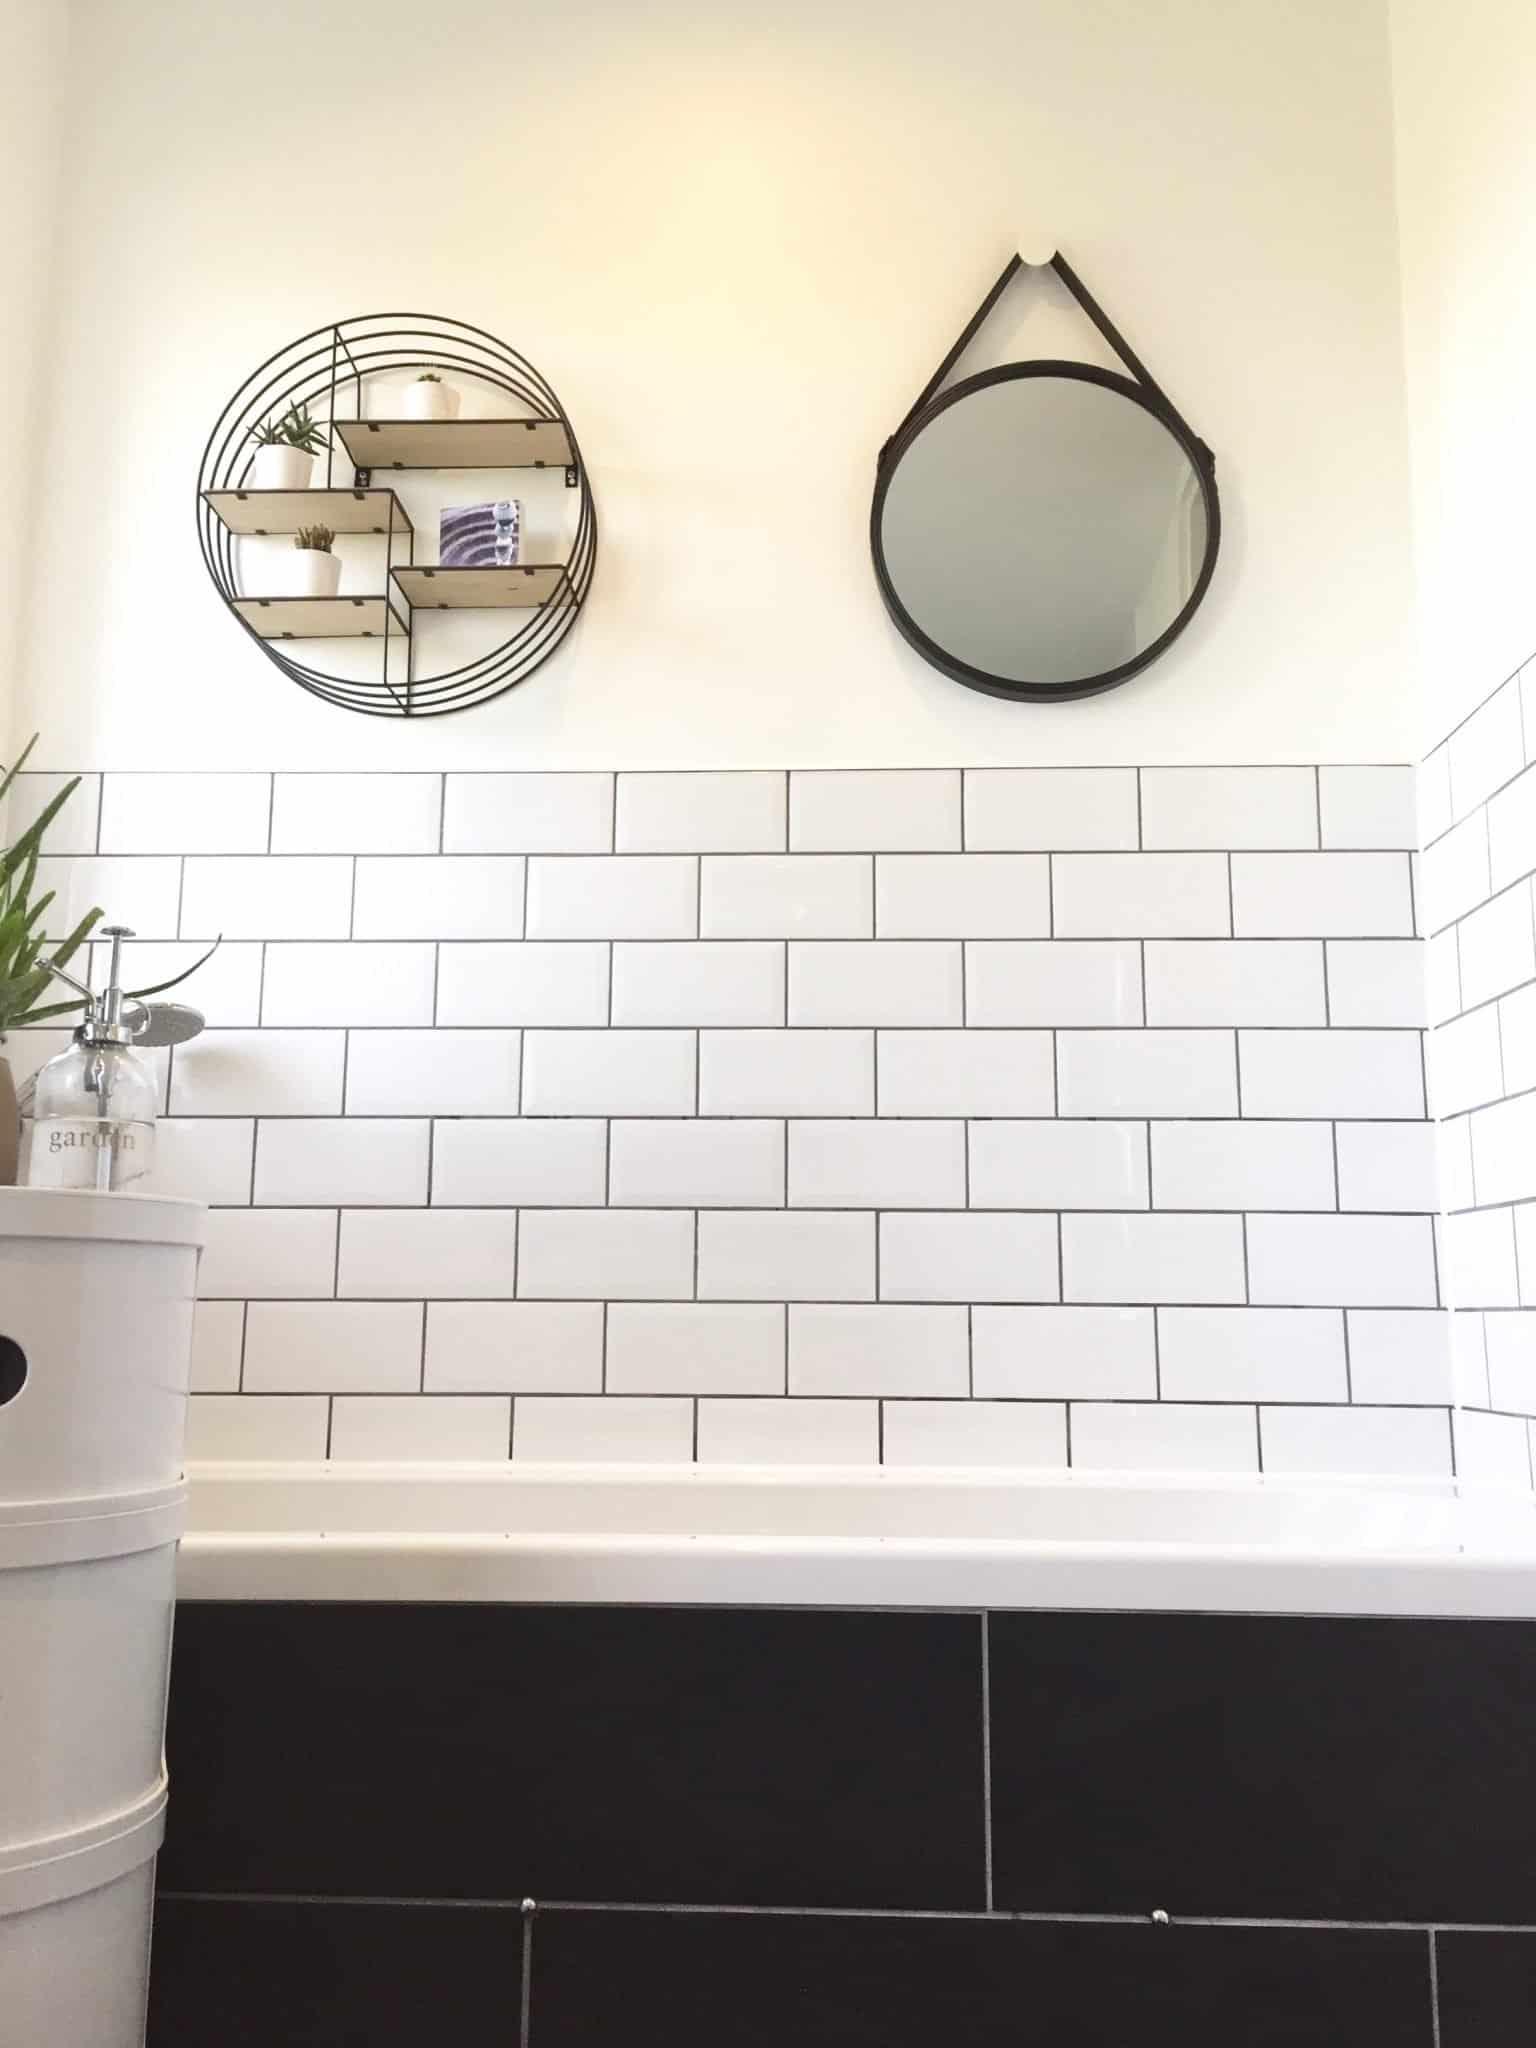 White metro tiles and grey grout, circular shelves and mirror